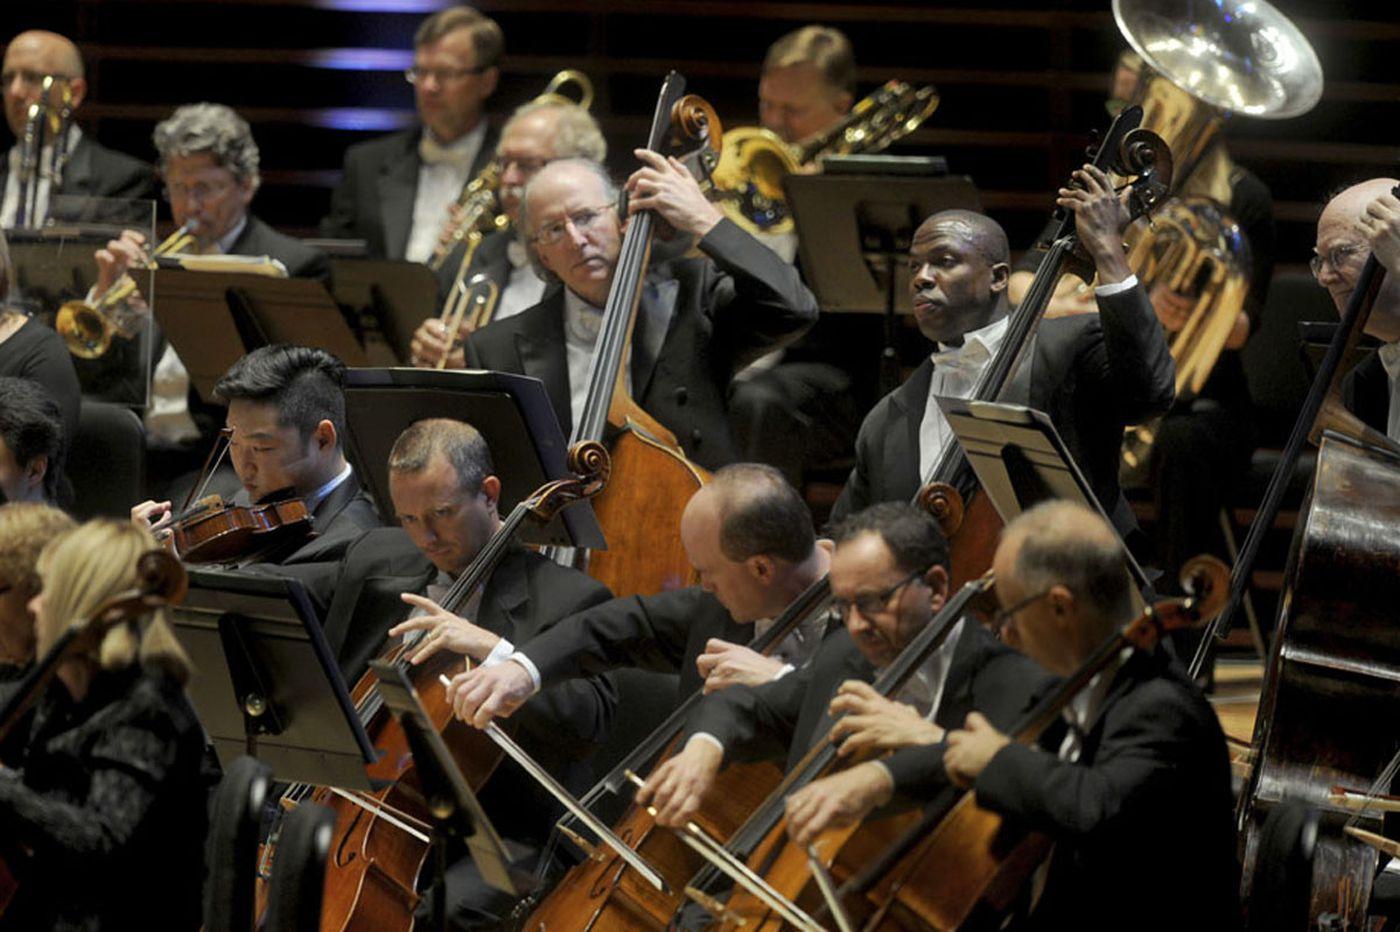 The Philadelphia Orchestra needs to rethink its future